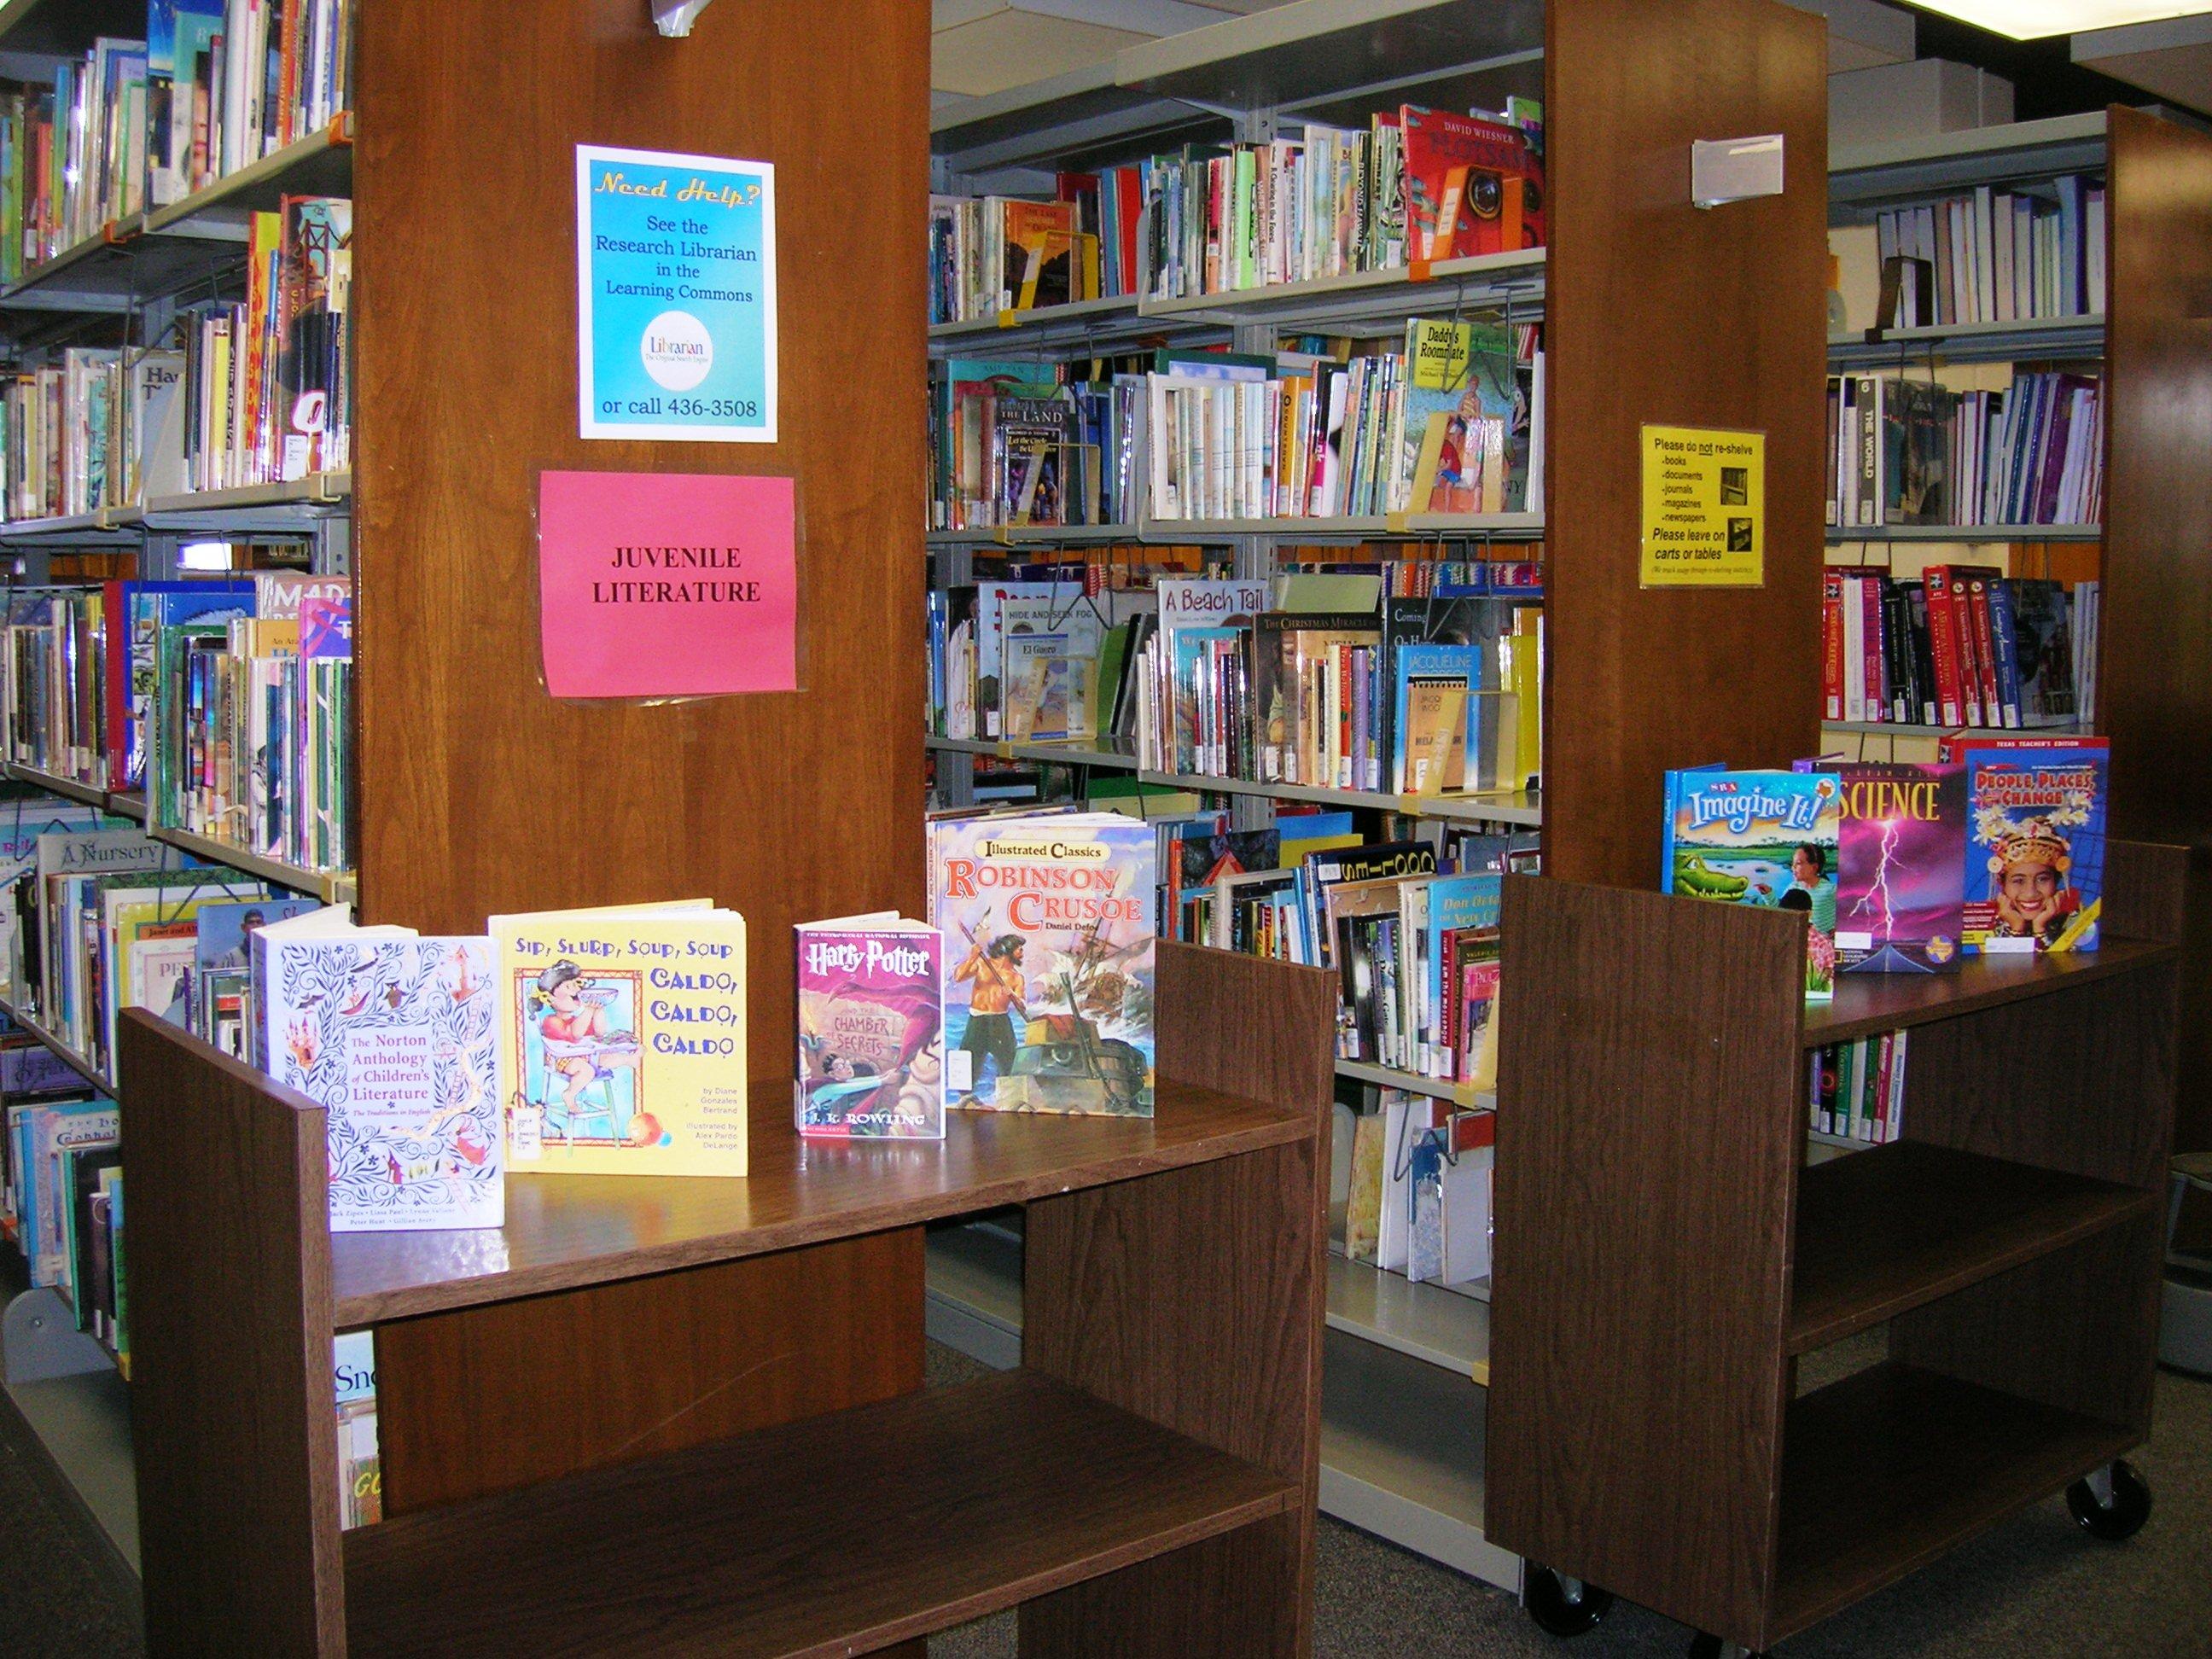 Juvenile Literature & Textbook Collection